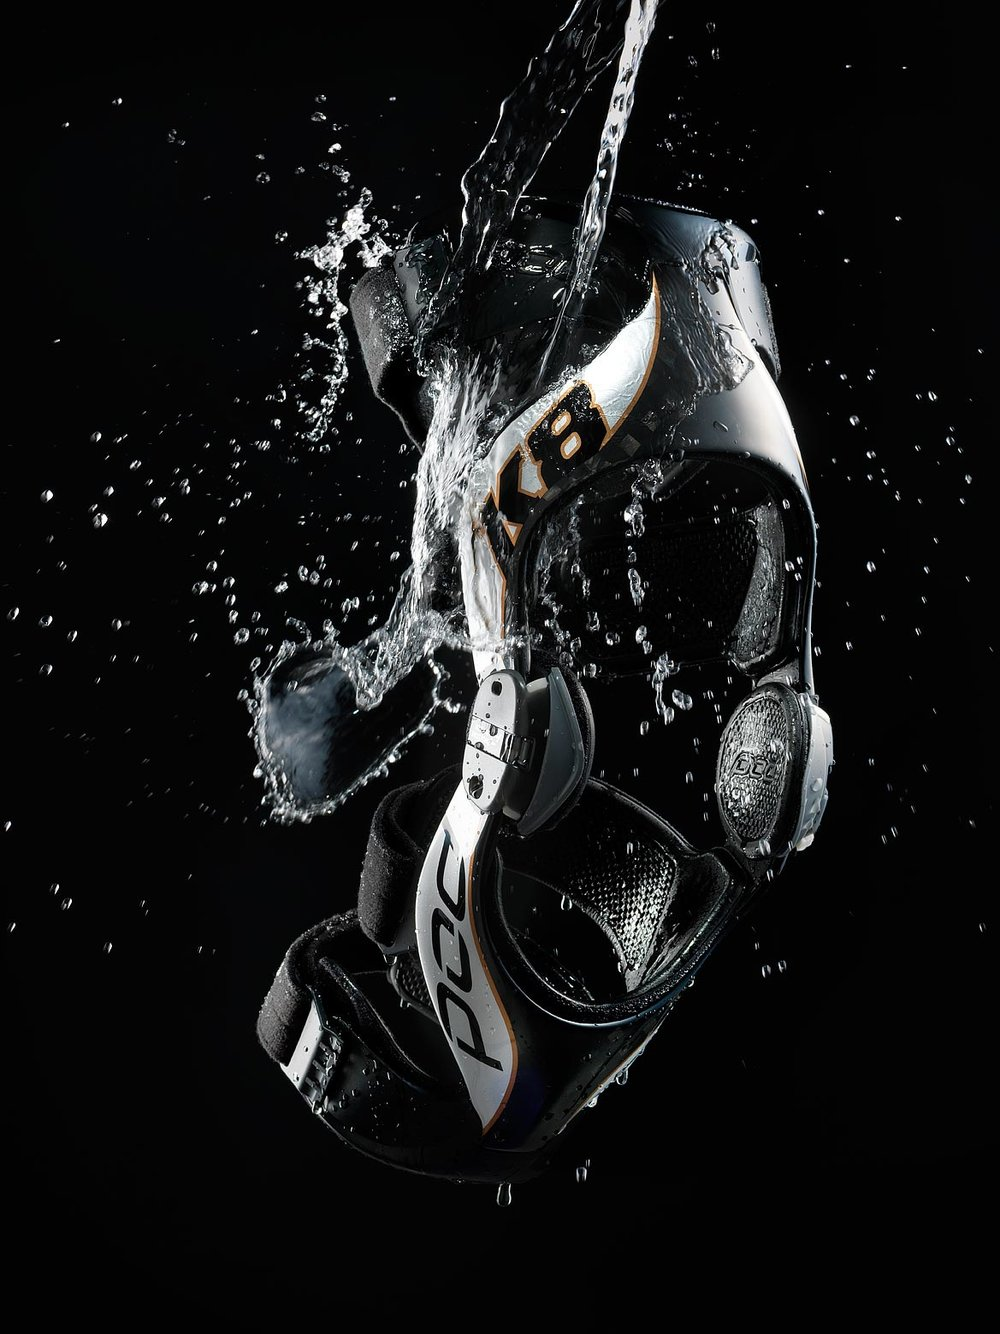 pod-kneebrace-product-advertising-photography_1.jpg